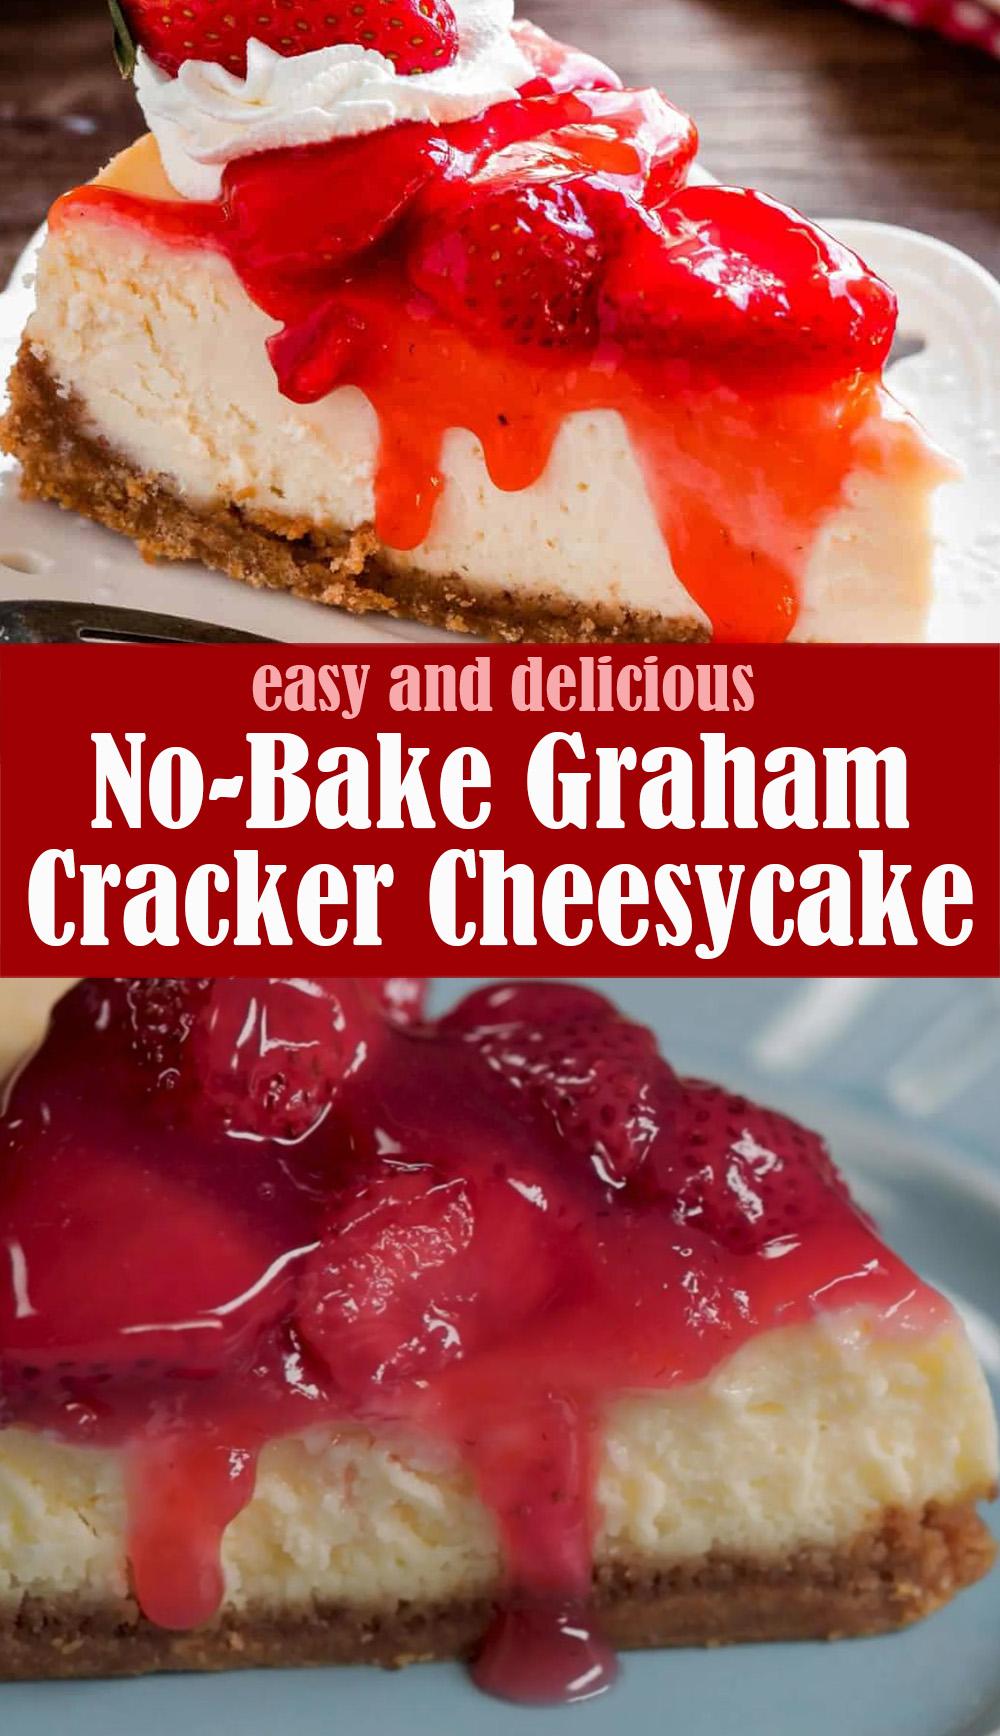 Easy No-Bake Graham Cracker Cheesycake